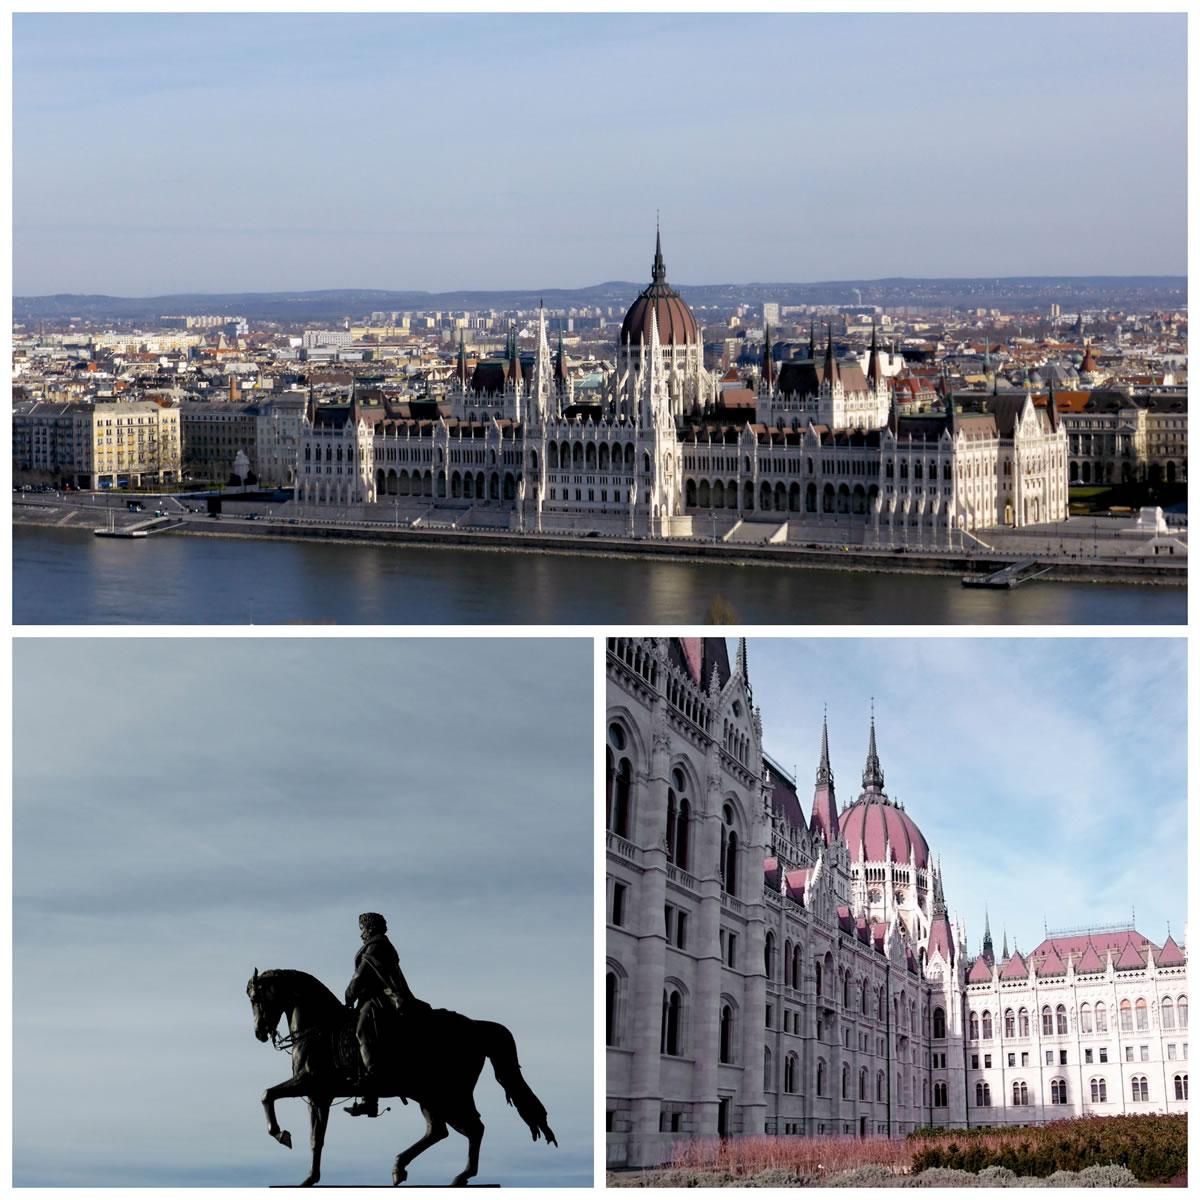 Pest-Parlement-Budapest